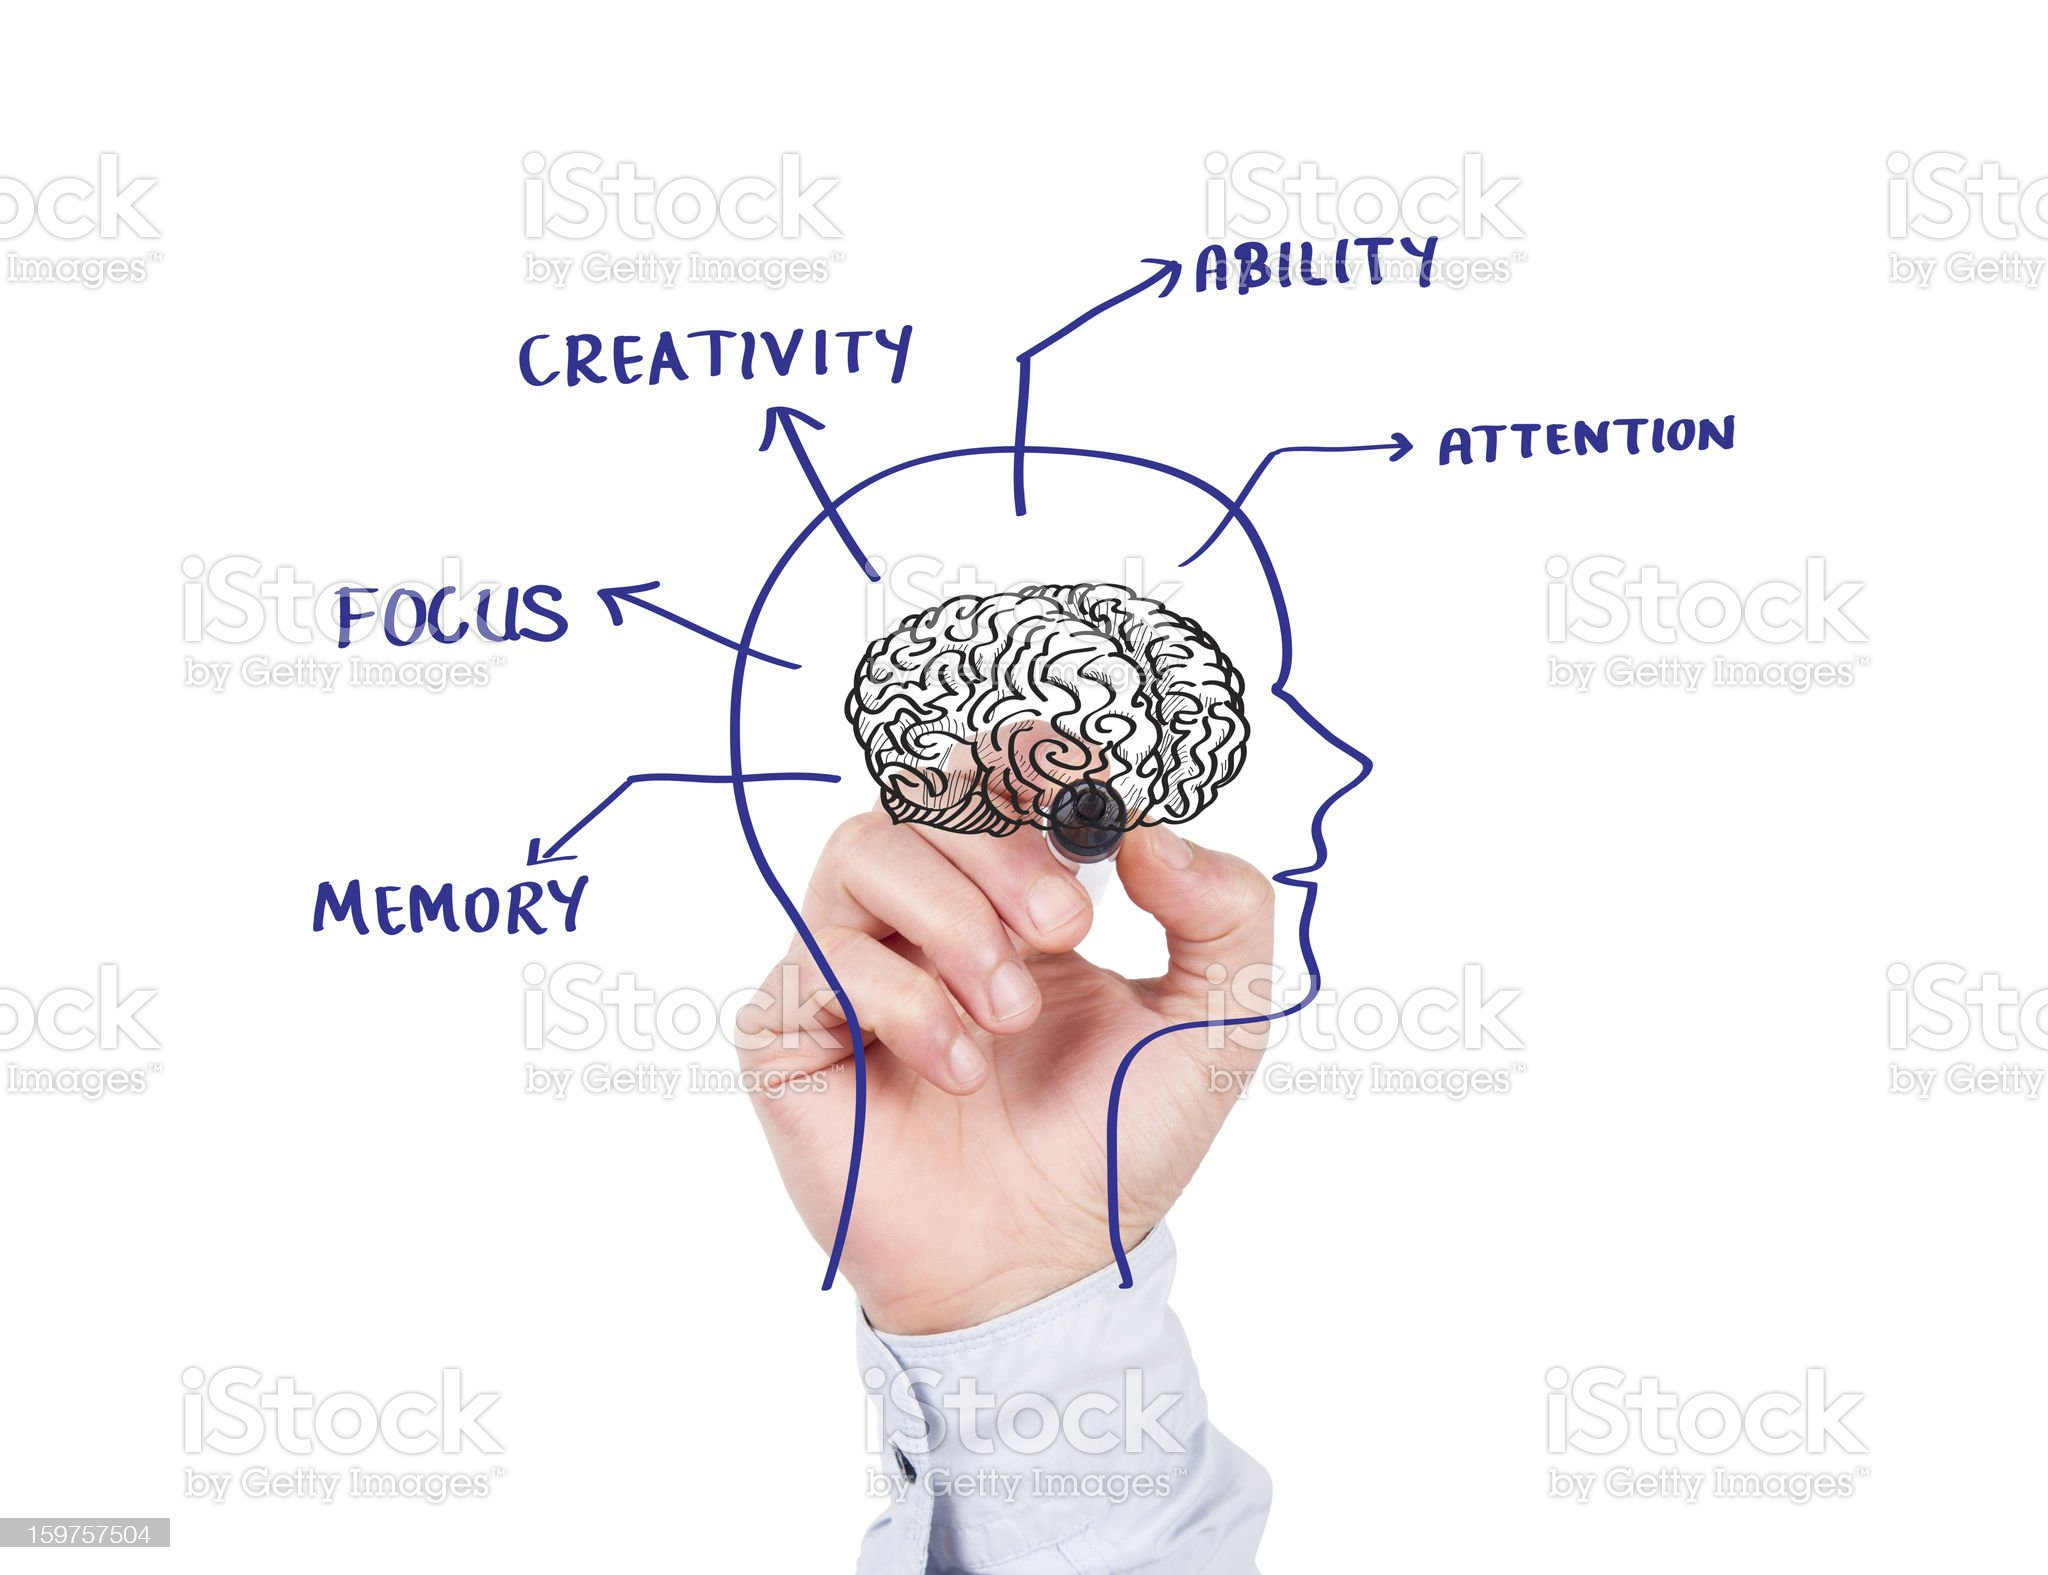 Human Brain Concept on Whiteboard royalty-free stock photo